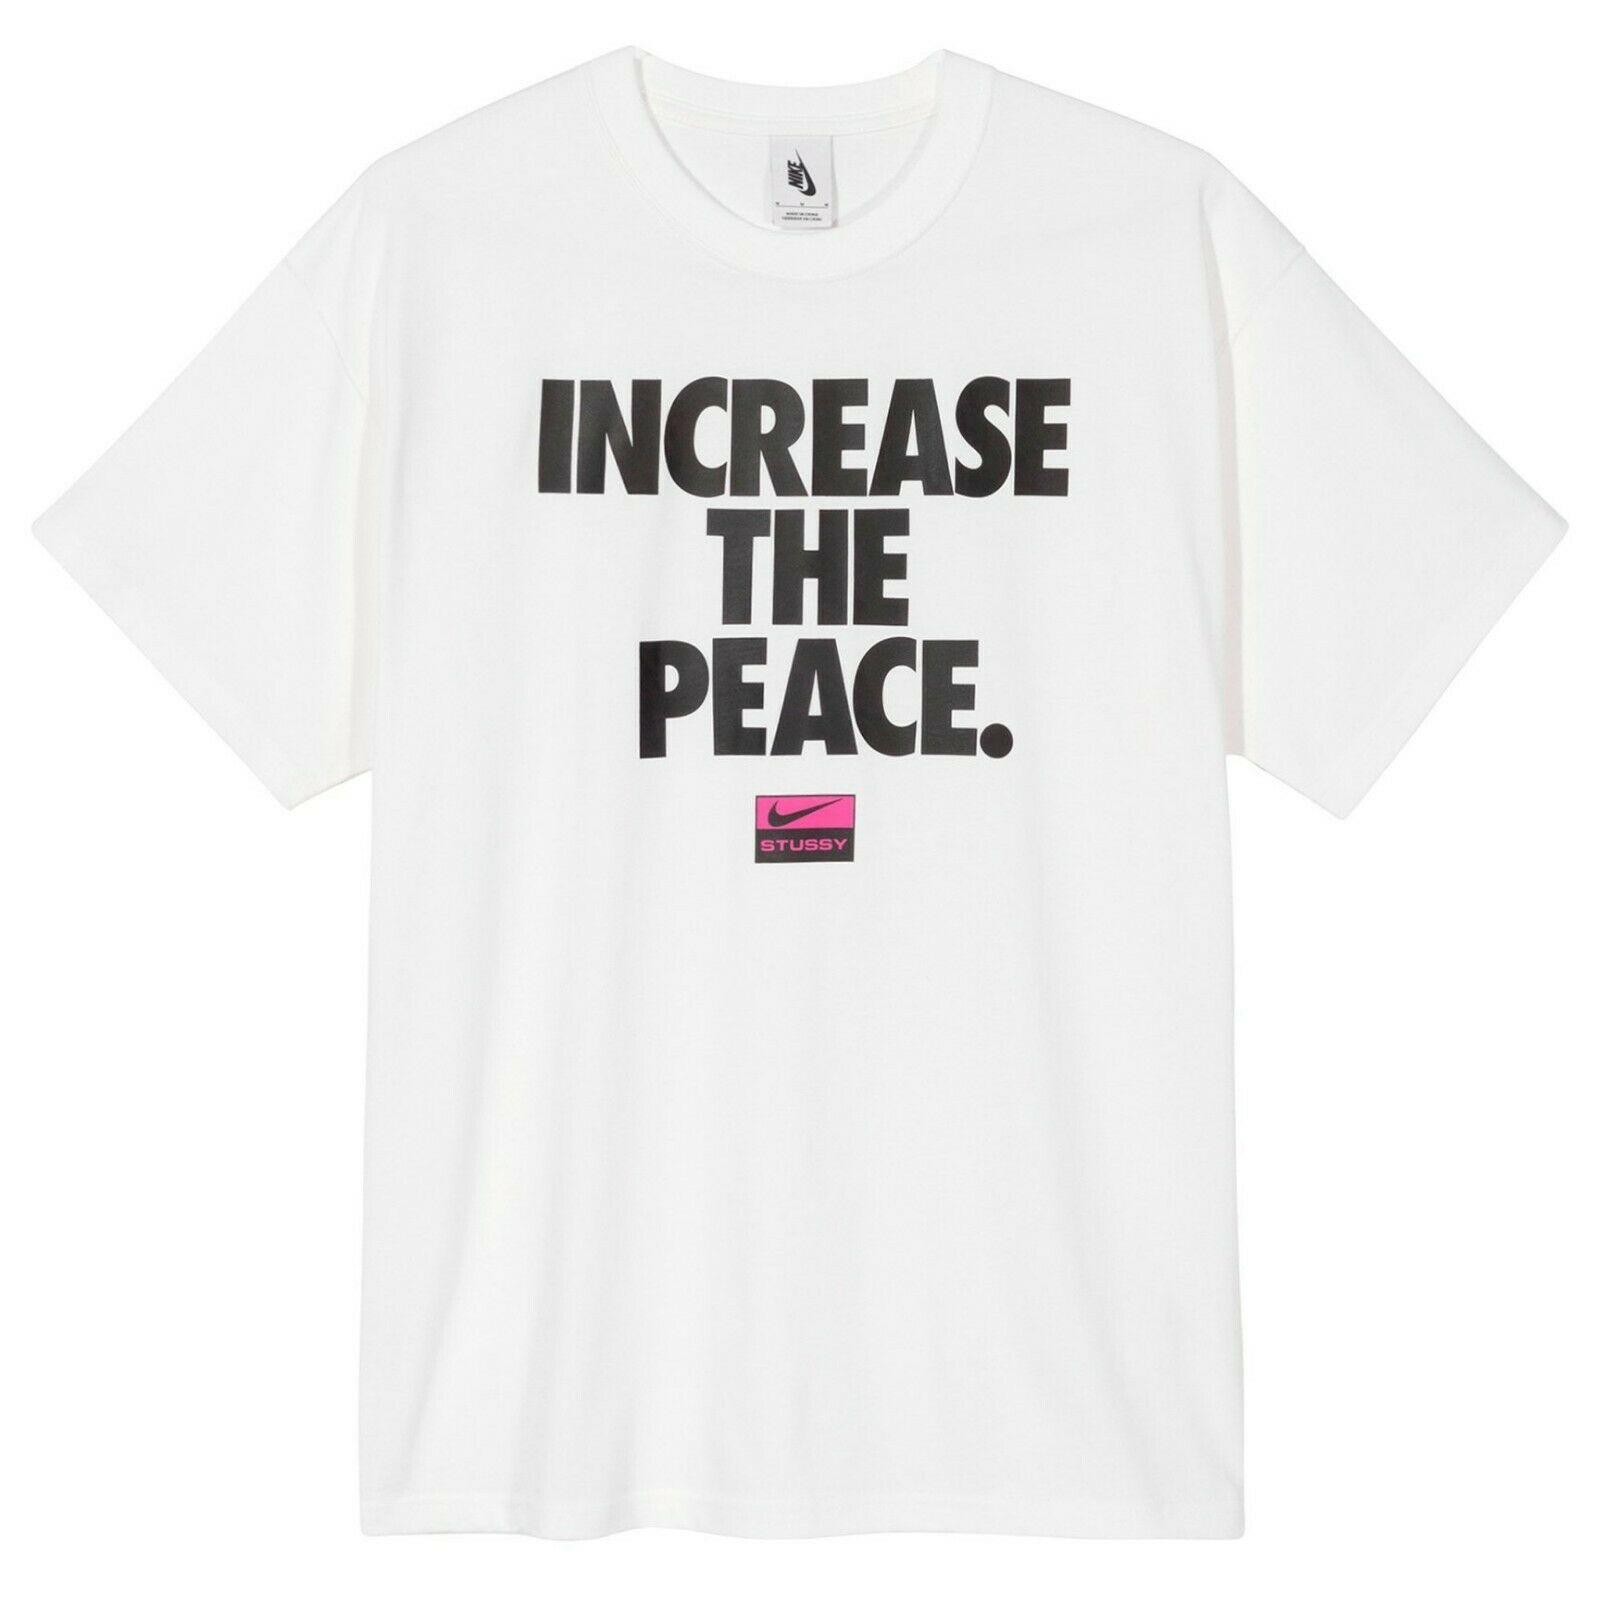 Stussy / Nike INCREASE THE PEACE Tee XL - Air Zoom Spiridon Cage 2 Apparel